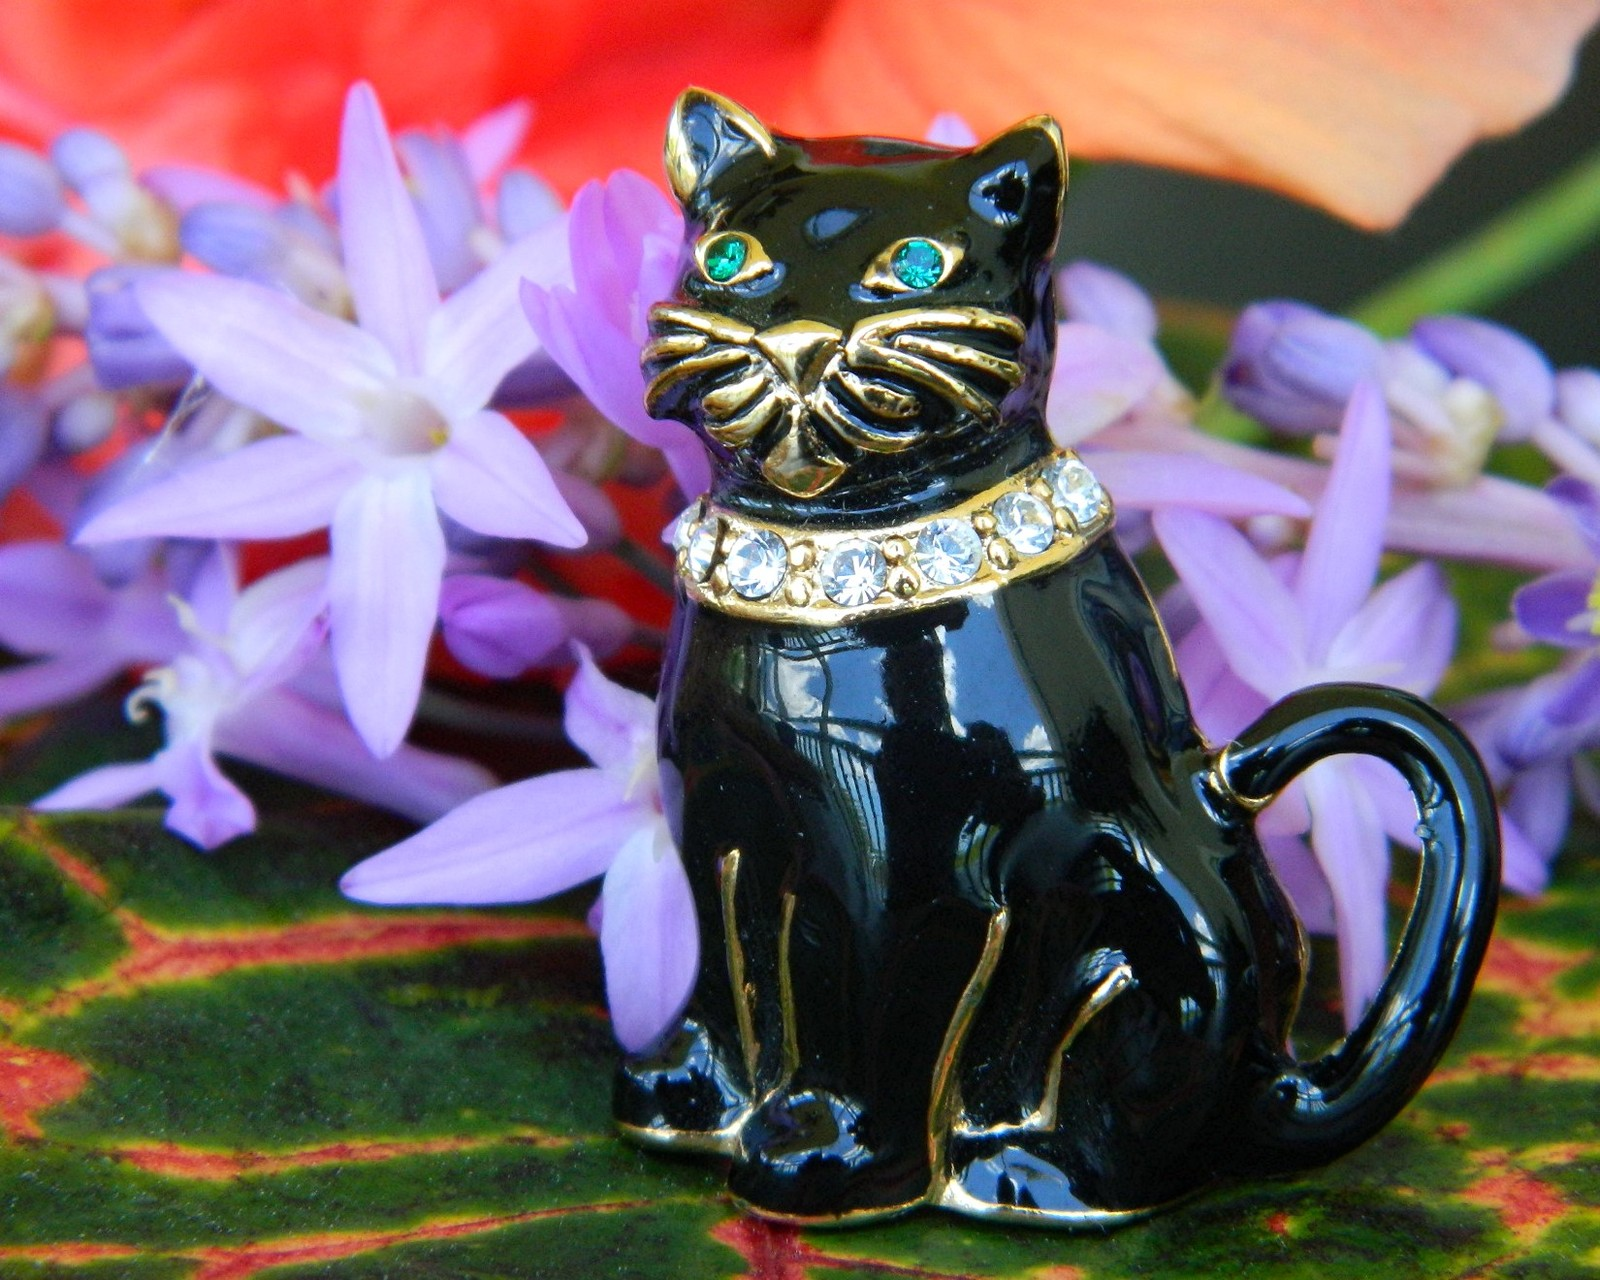 Vintage Monet Black Cat Brooch Pin Enamel Rhinestones Collar Figural